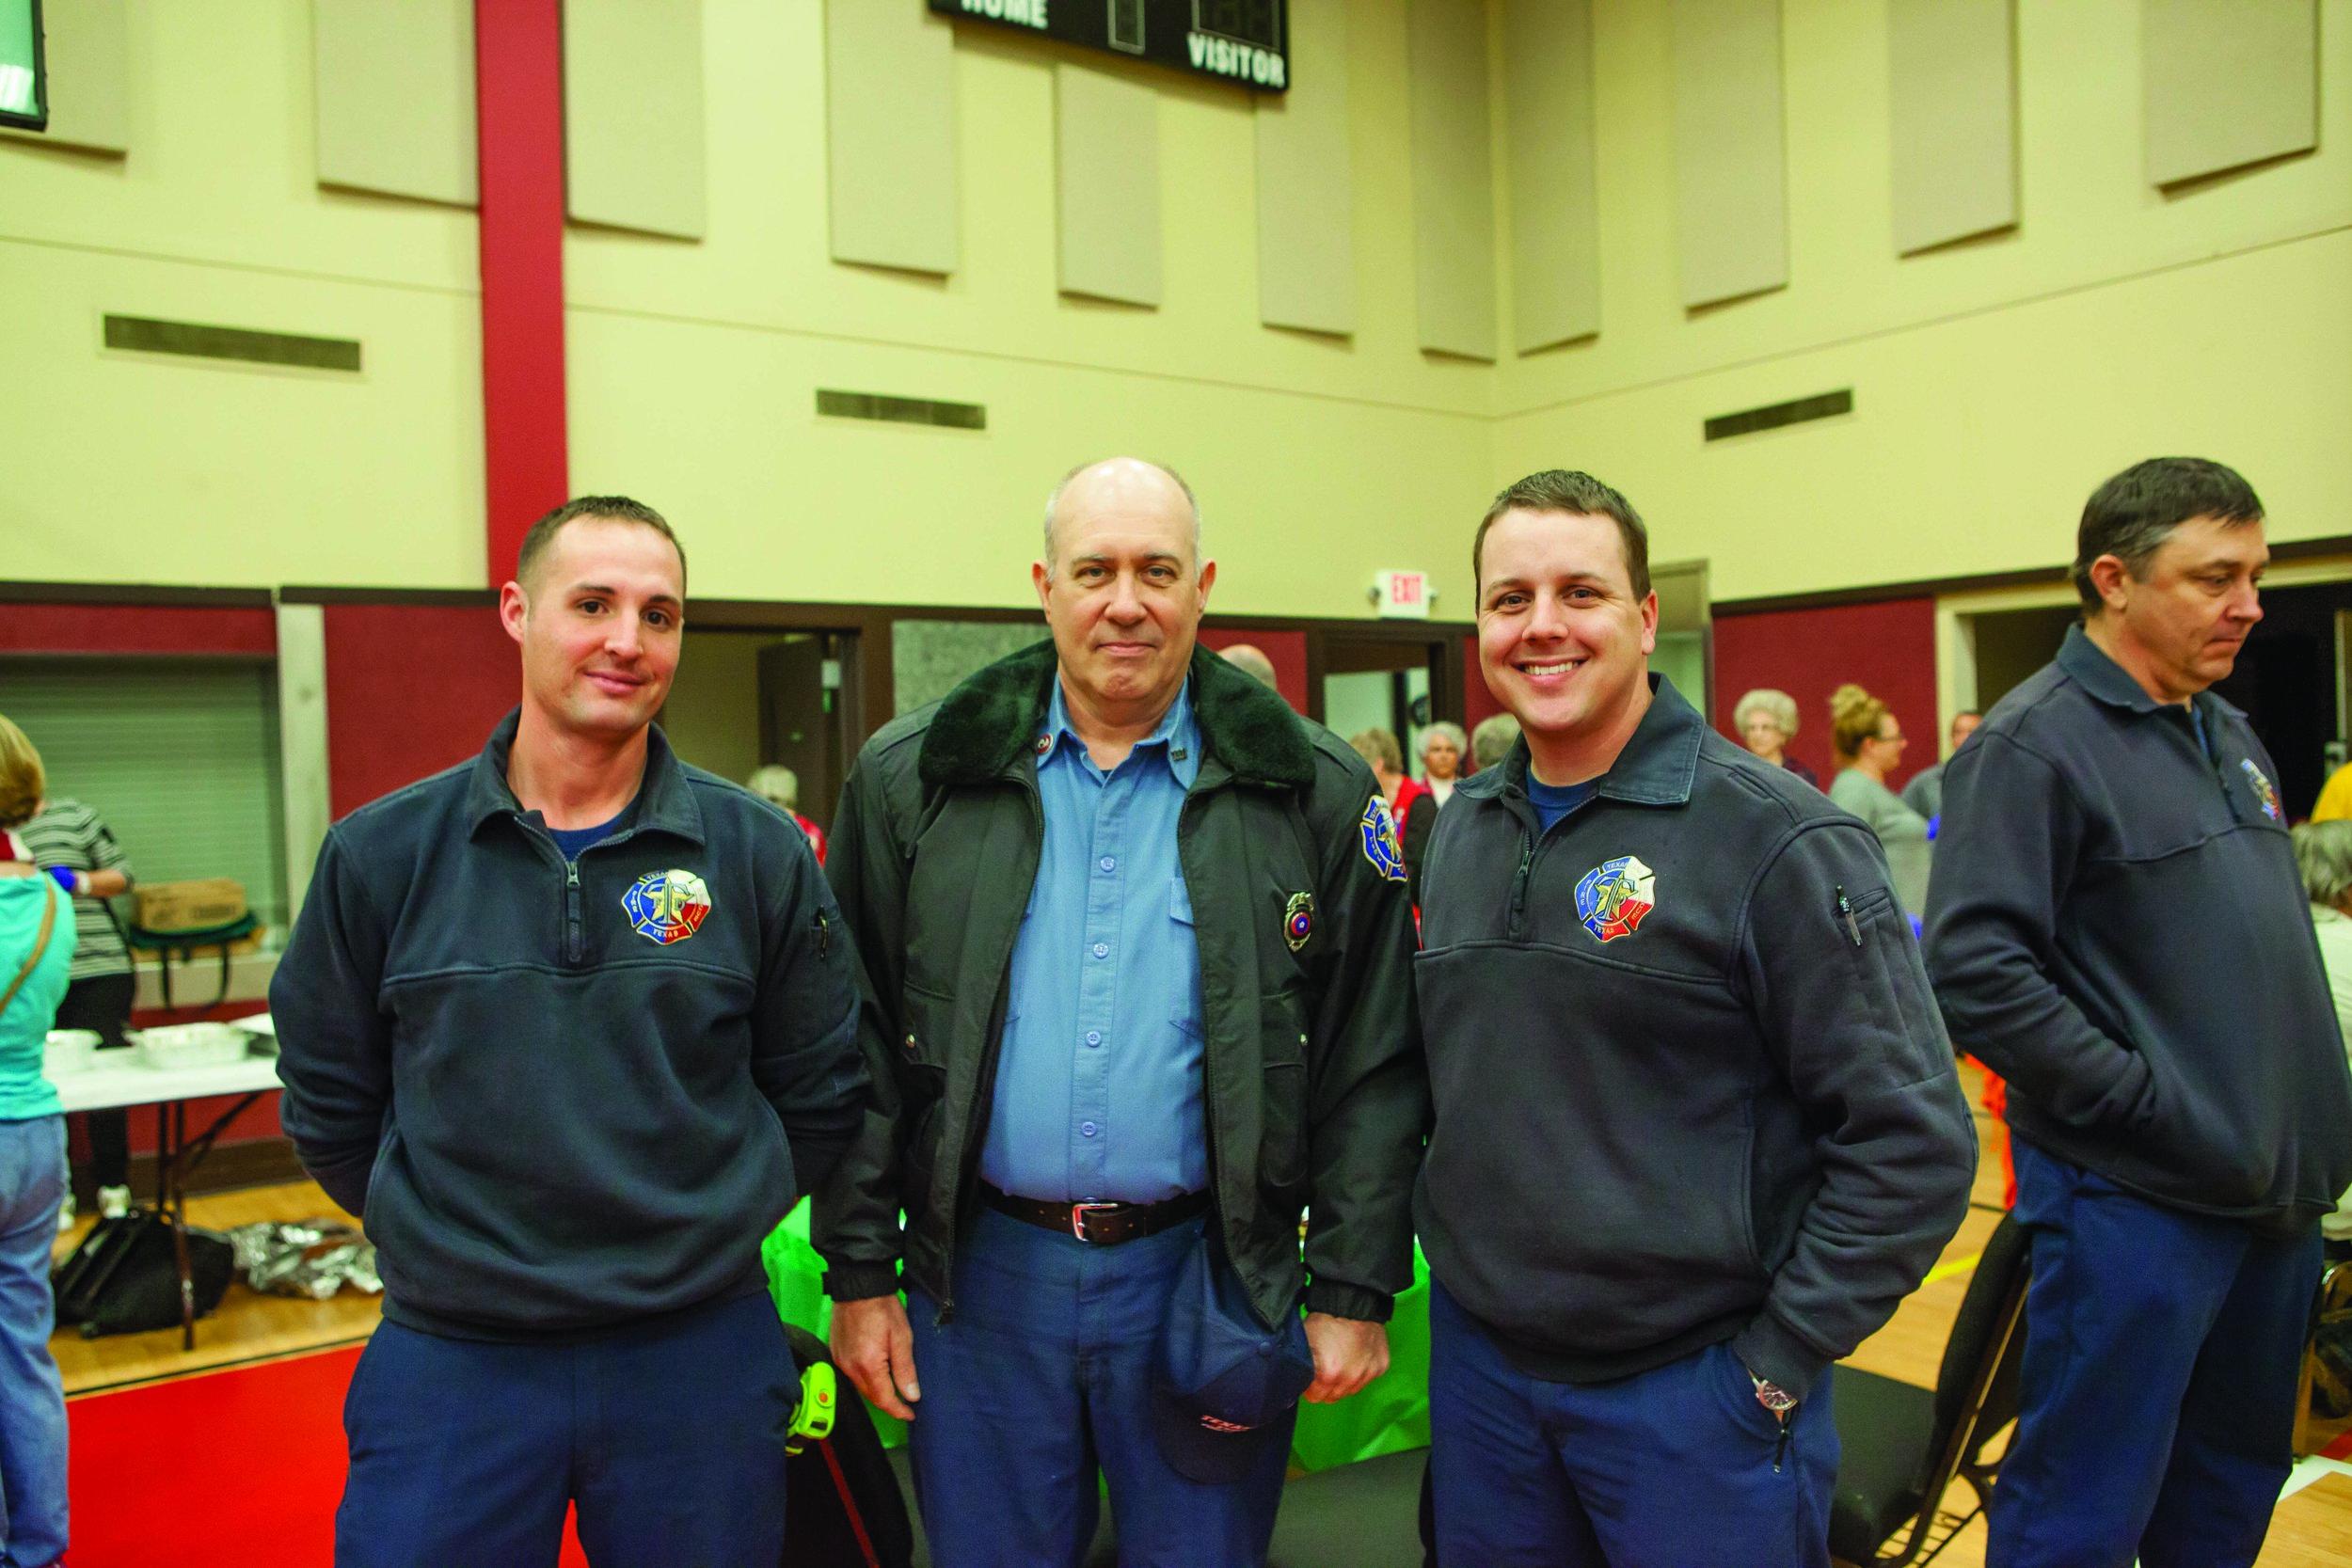 Mitchel Wood, Keith Smith and Zach Flanagan